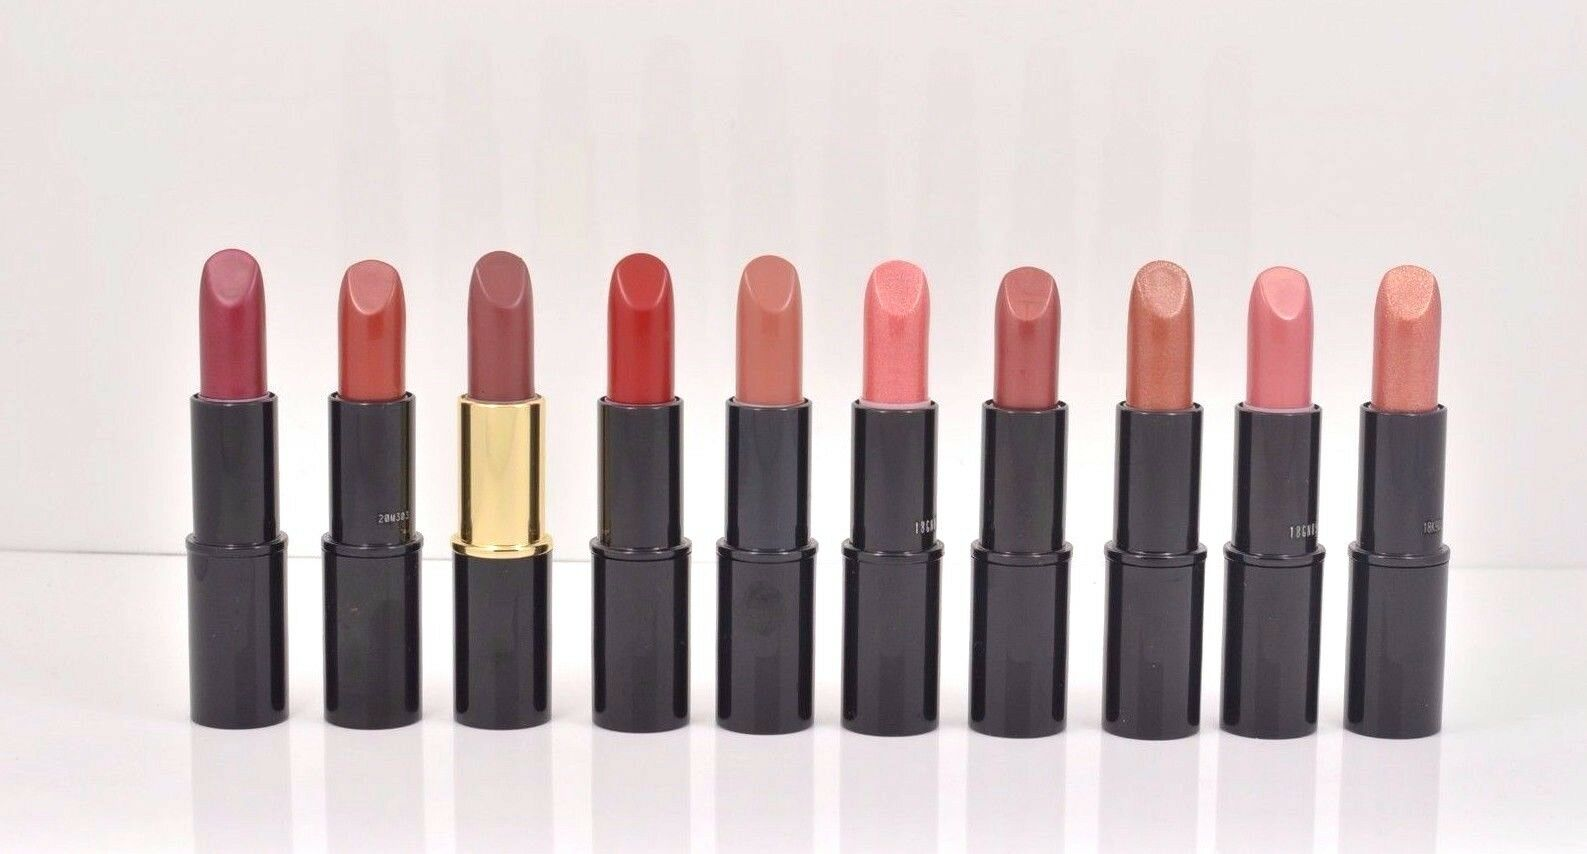 Lancome Color Design Lipstick Brand New Full Size - CHOOSE COLOR